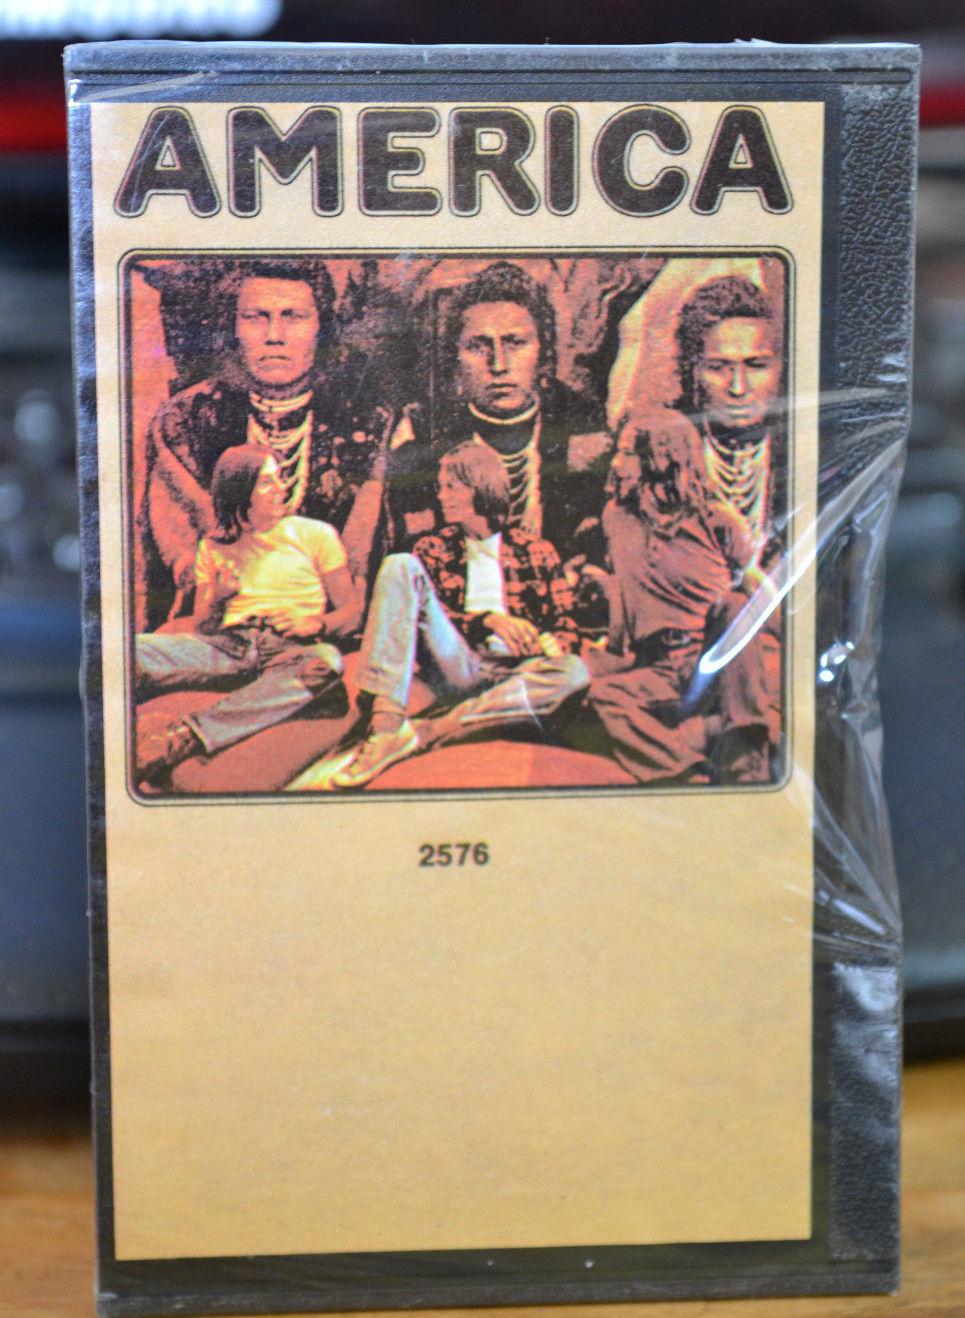 AMERICA - America - 52576 - Factory Sealed 1972 Pressing - Warner Brothers